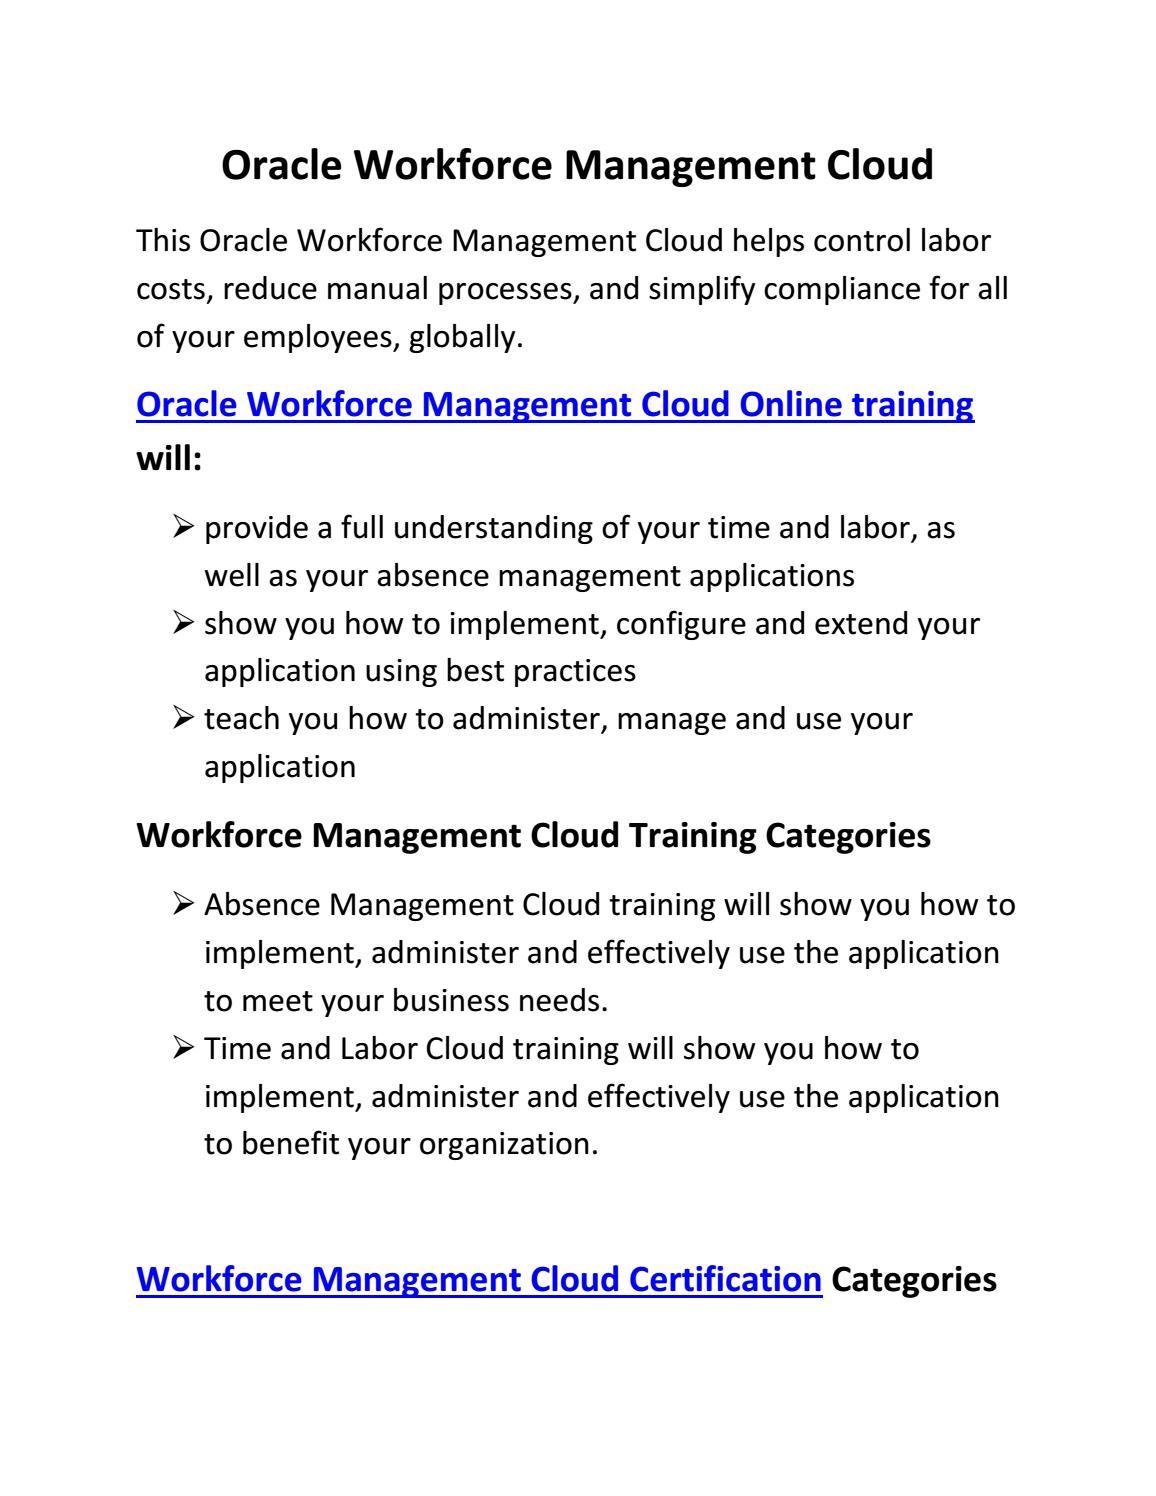 oracle workforce management online training by maxmunus7 - issuu